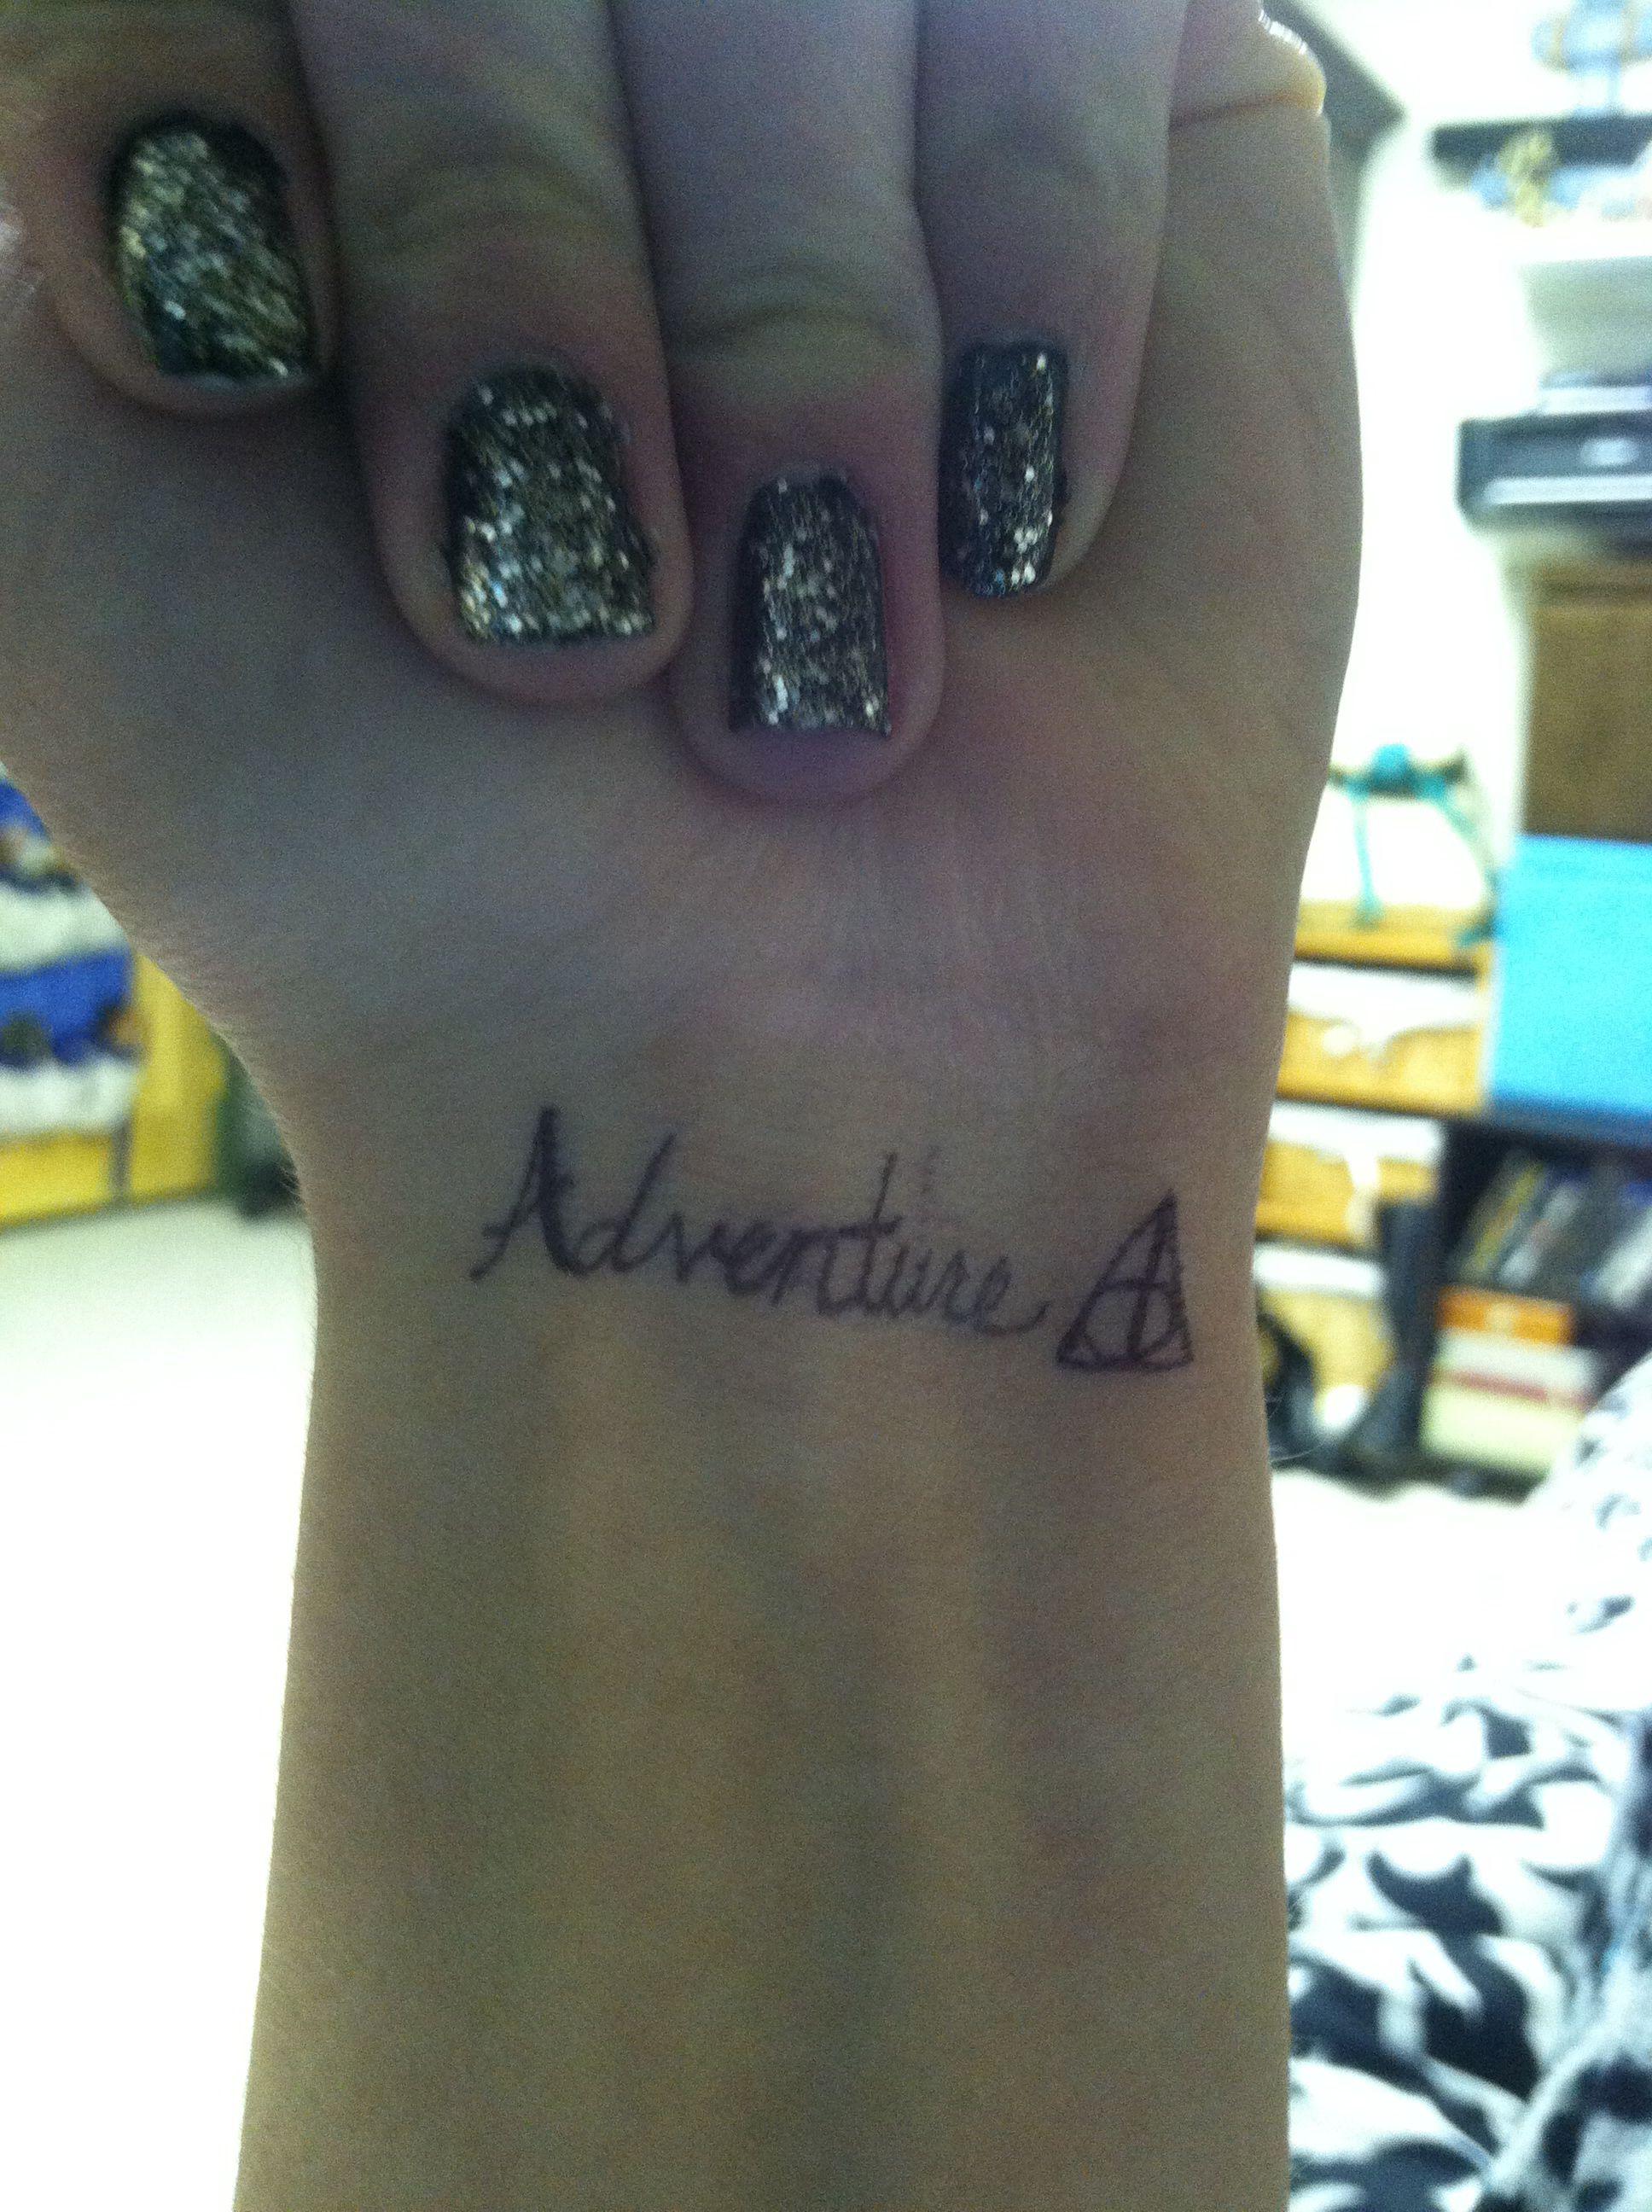 Yo quiero!!!